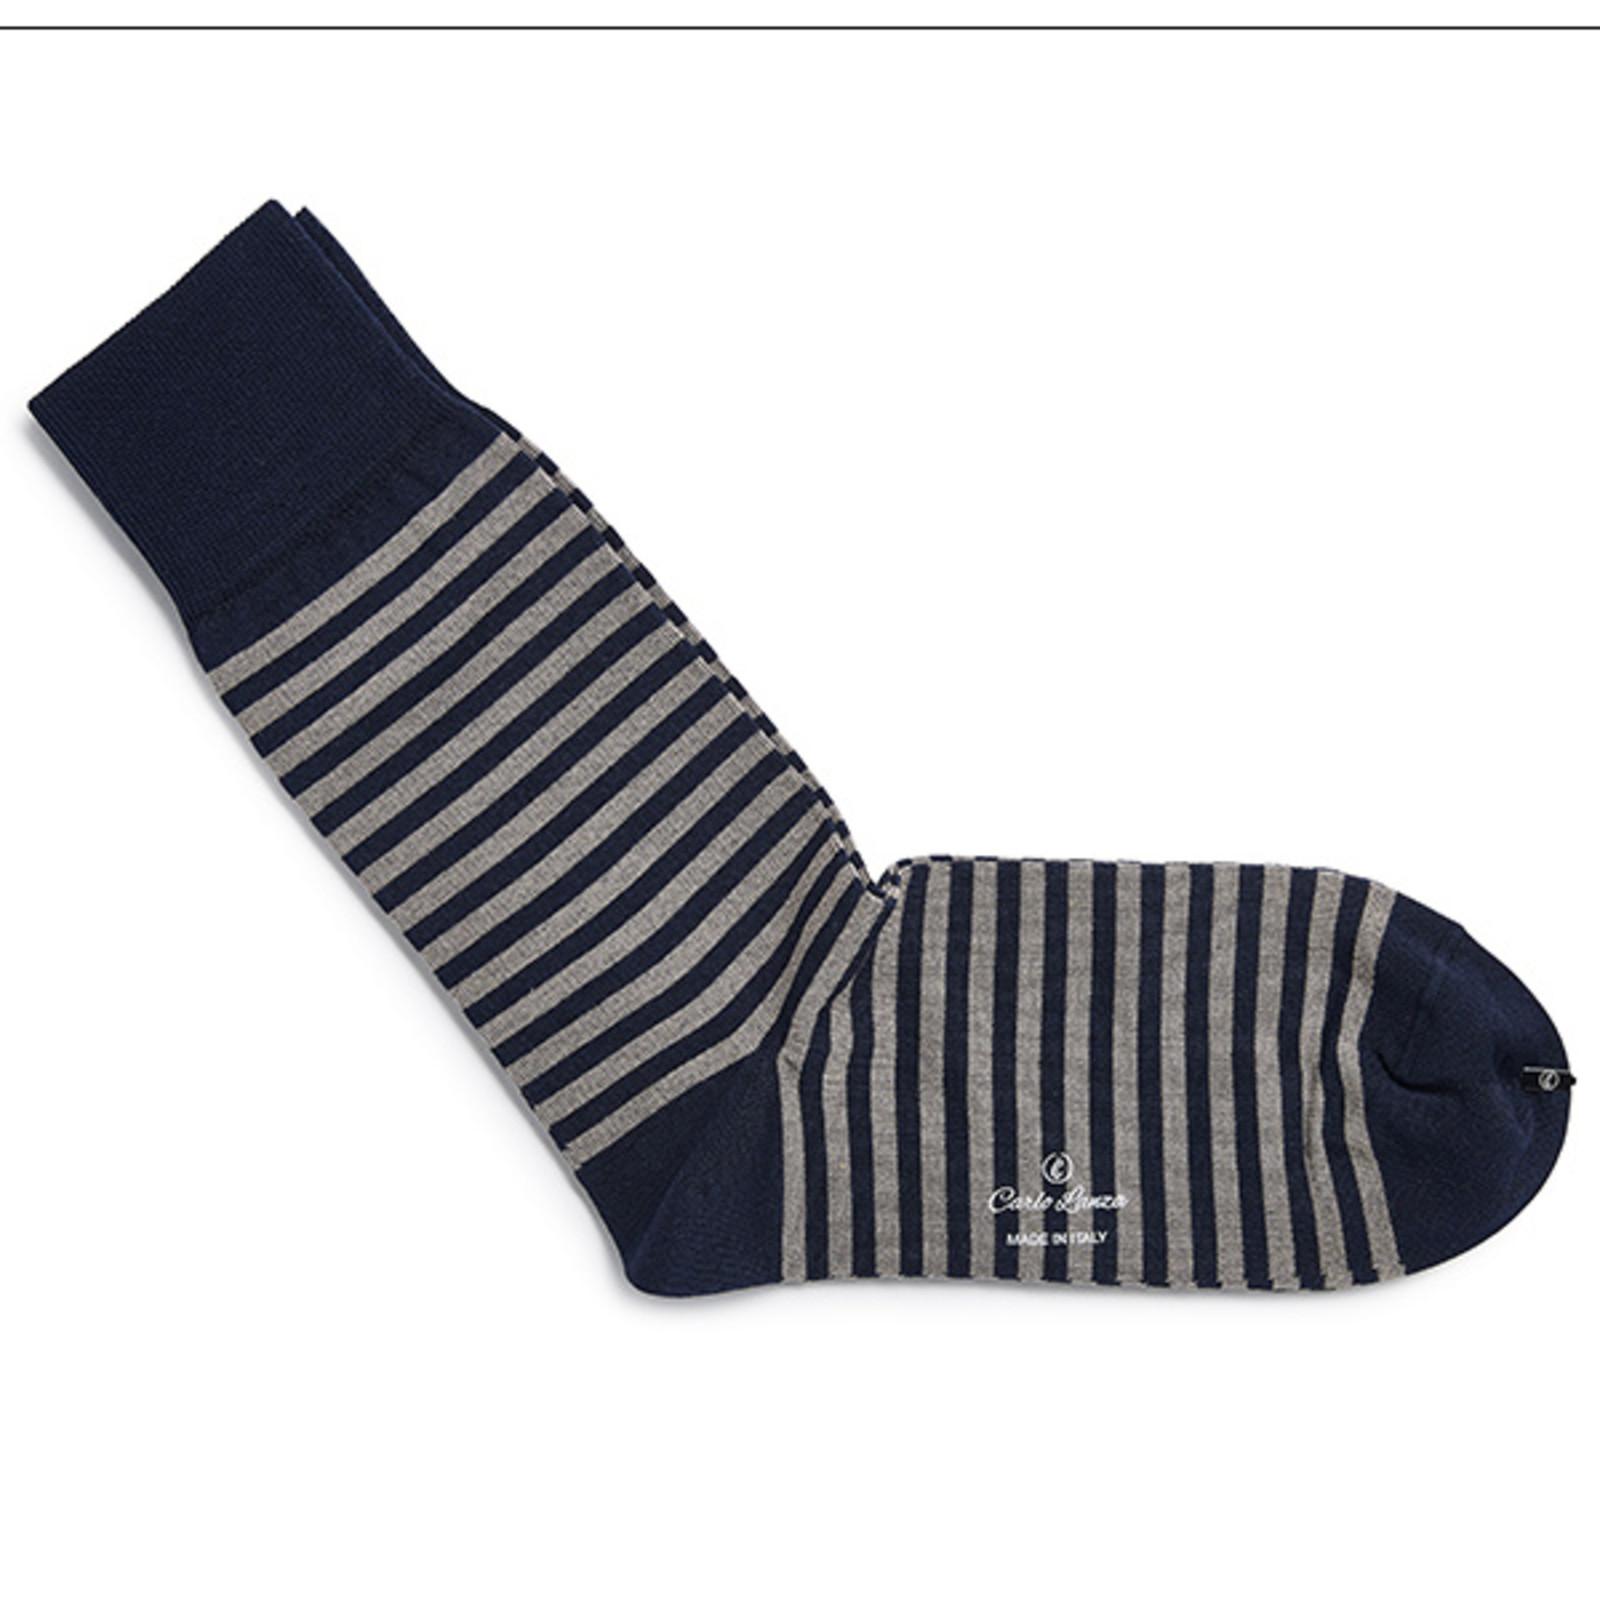 Carlo Lanza Dunkelblaue gestreifte Socken